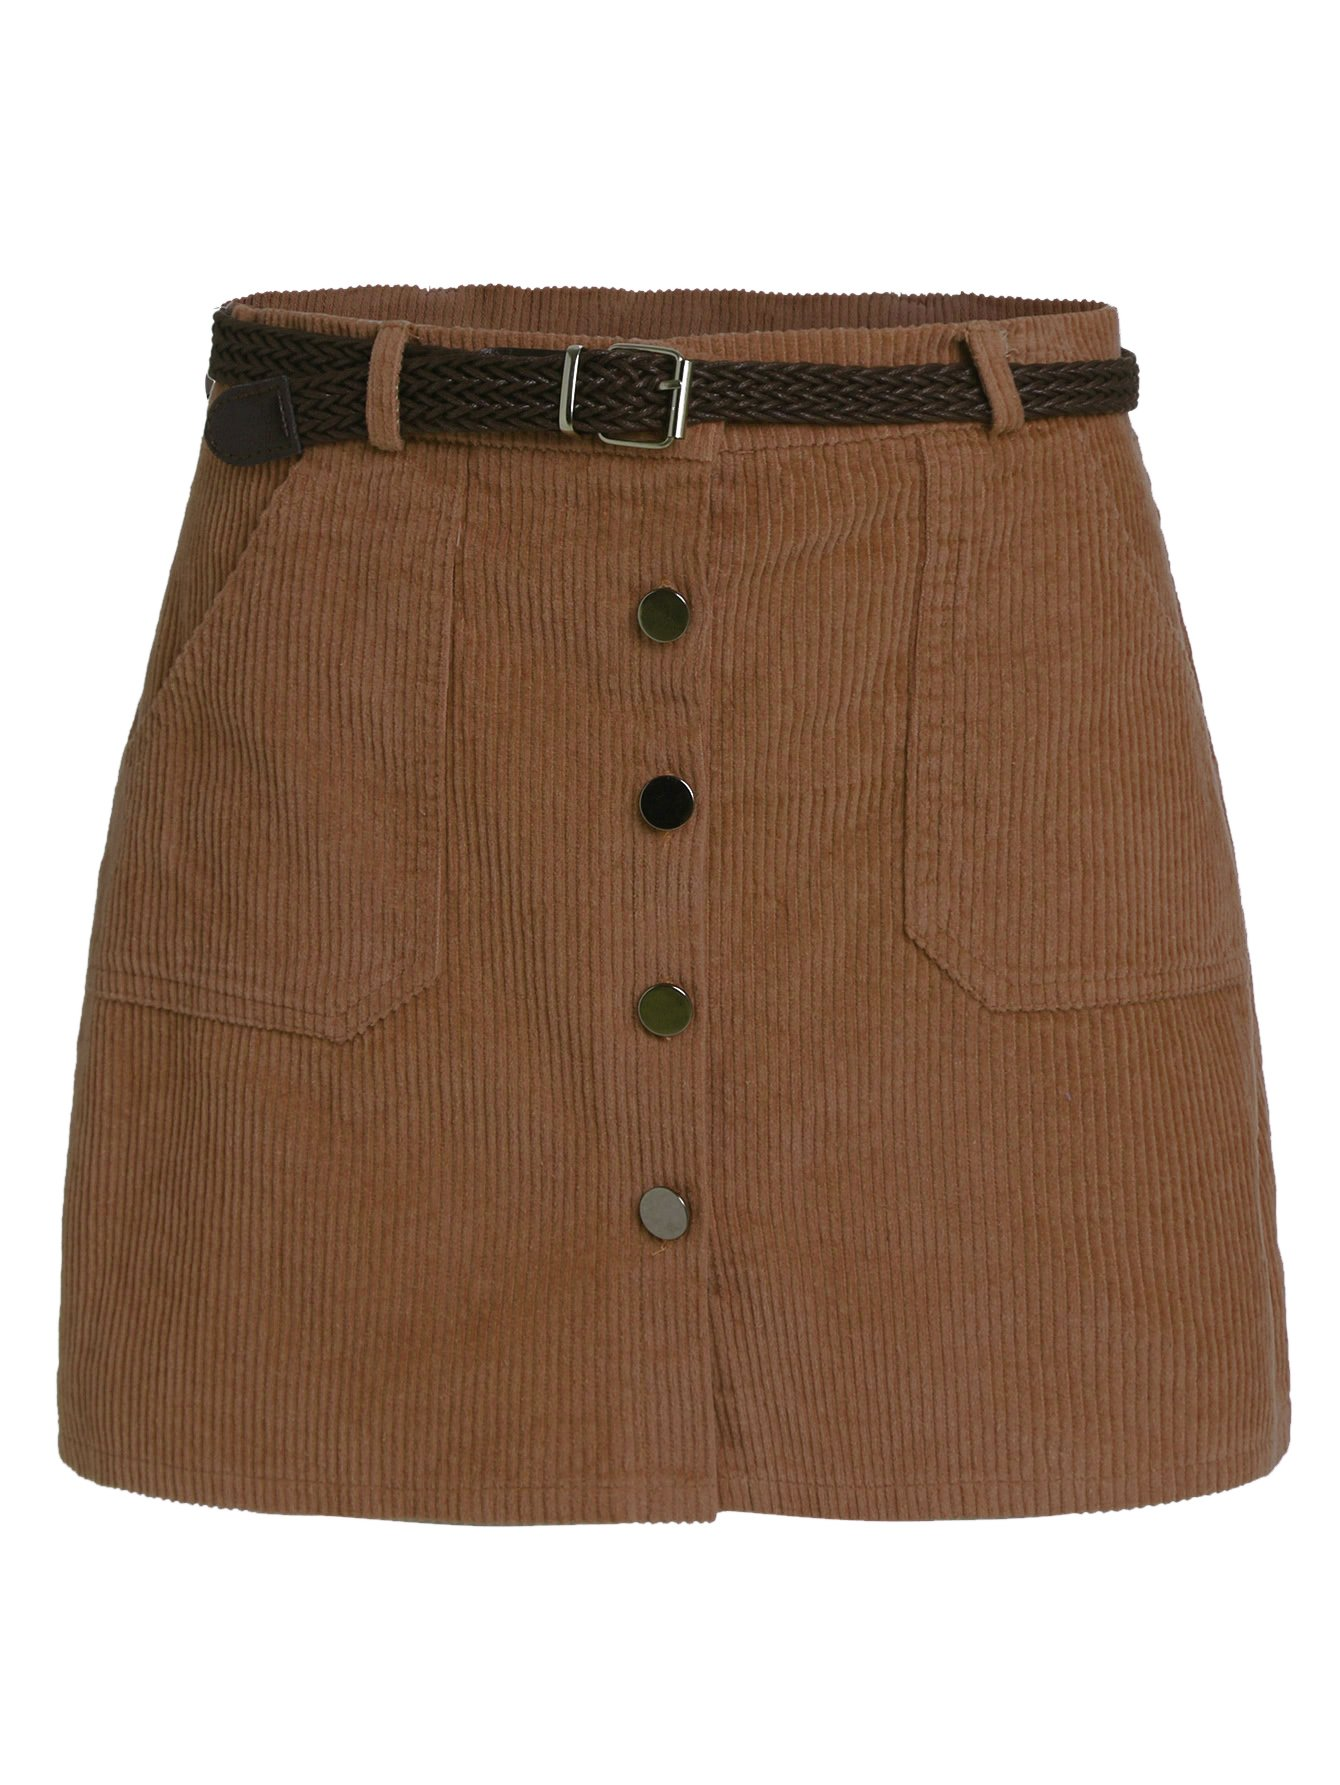 Romwe Women's Cute Mini Corduroy Button Down Pocket Skirt with Belt Brown M